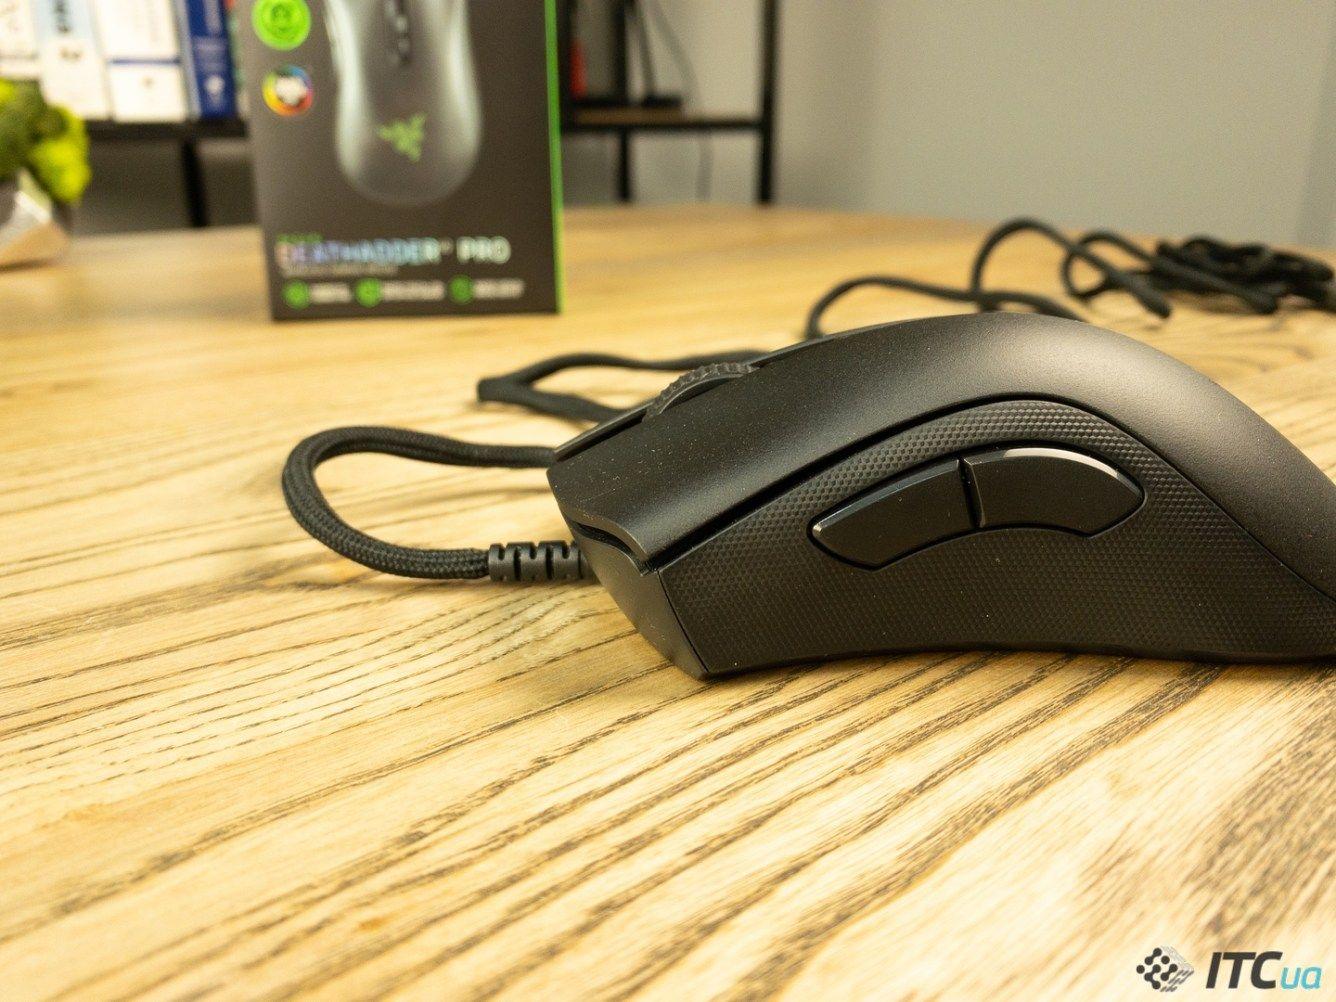 Мышка Razer DeathAdder V2 Pro. Фото 9